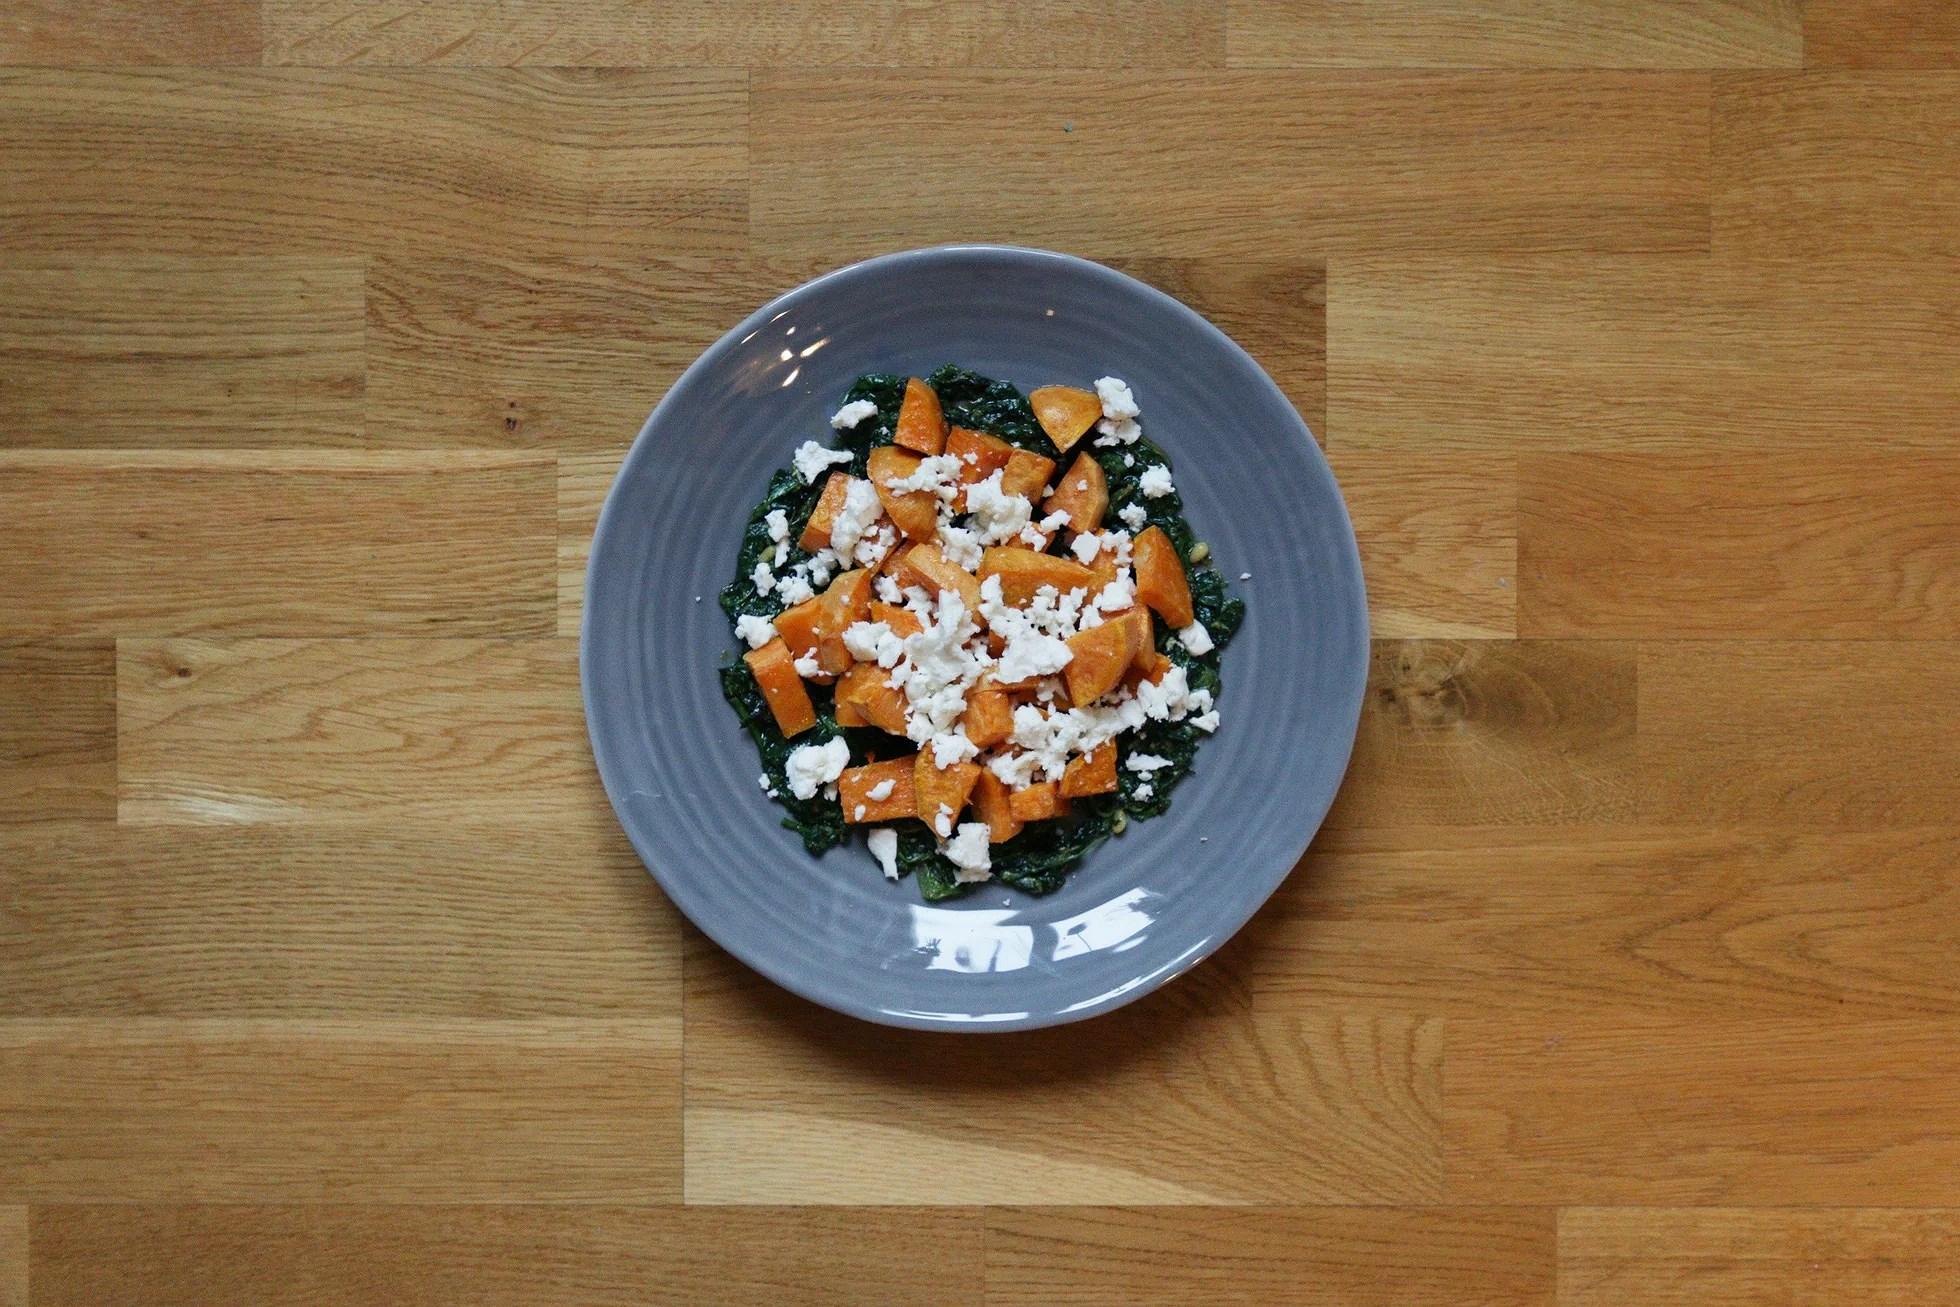 RECIPE/SWEET POTATO SALAD WITH FETA CHEESE AND KALE